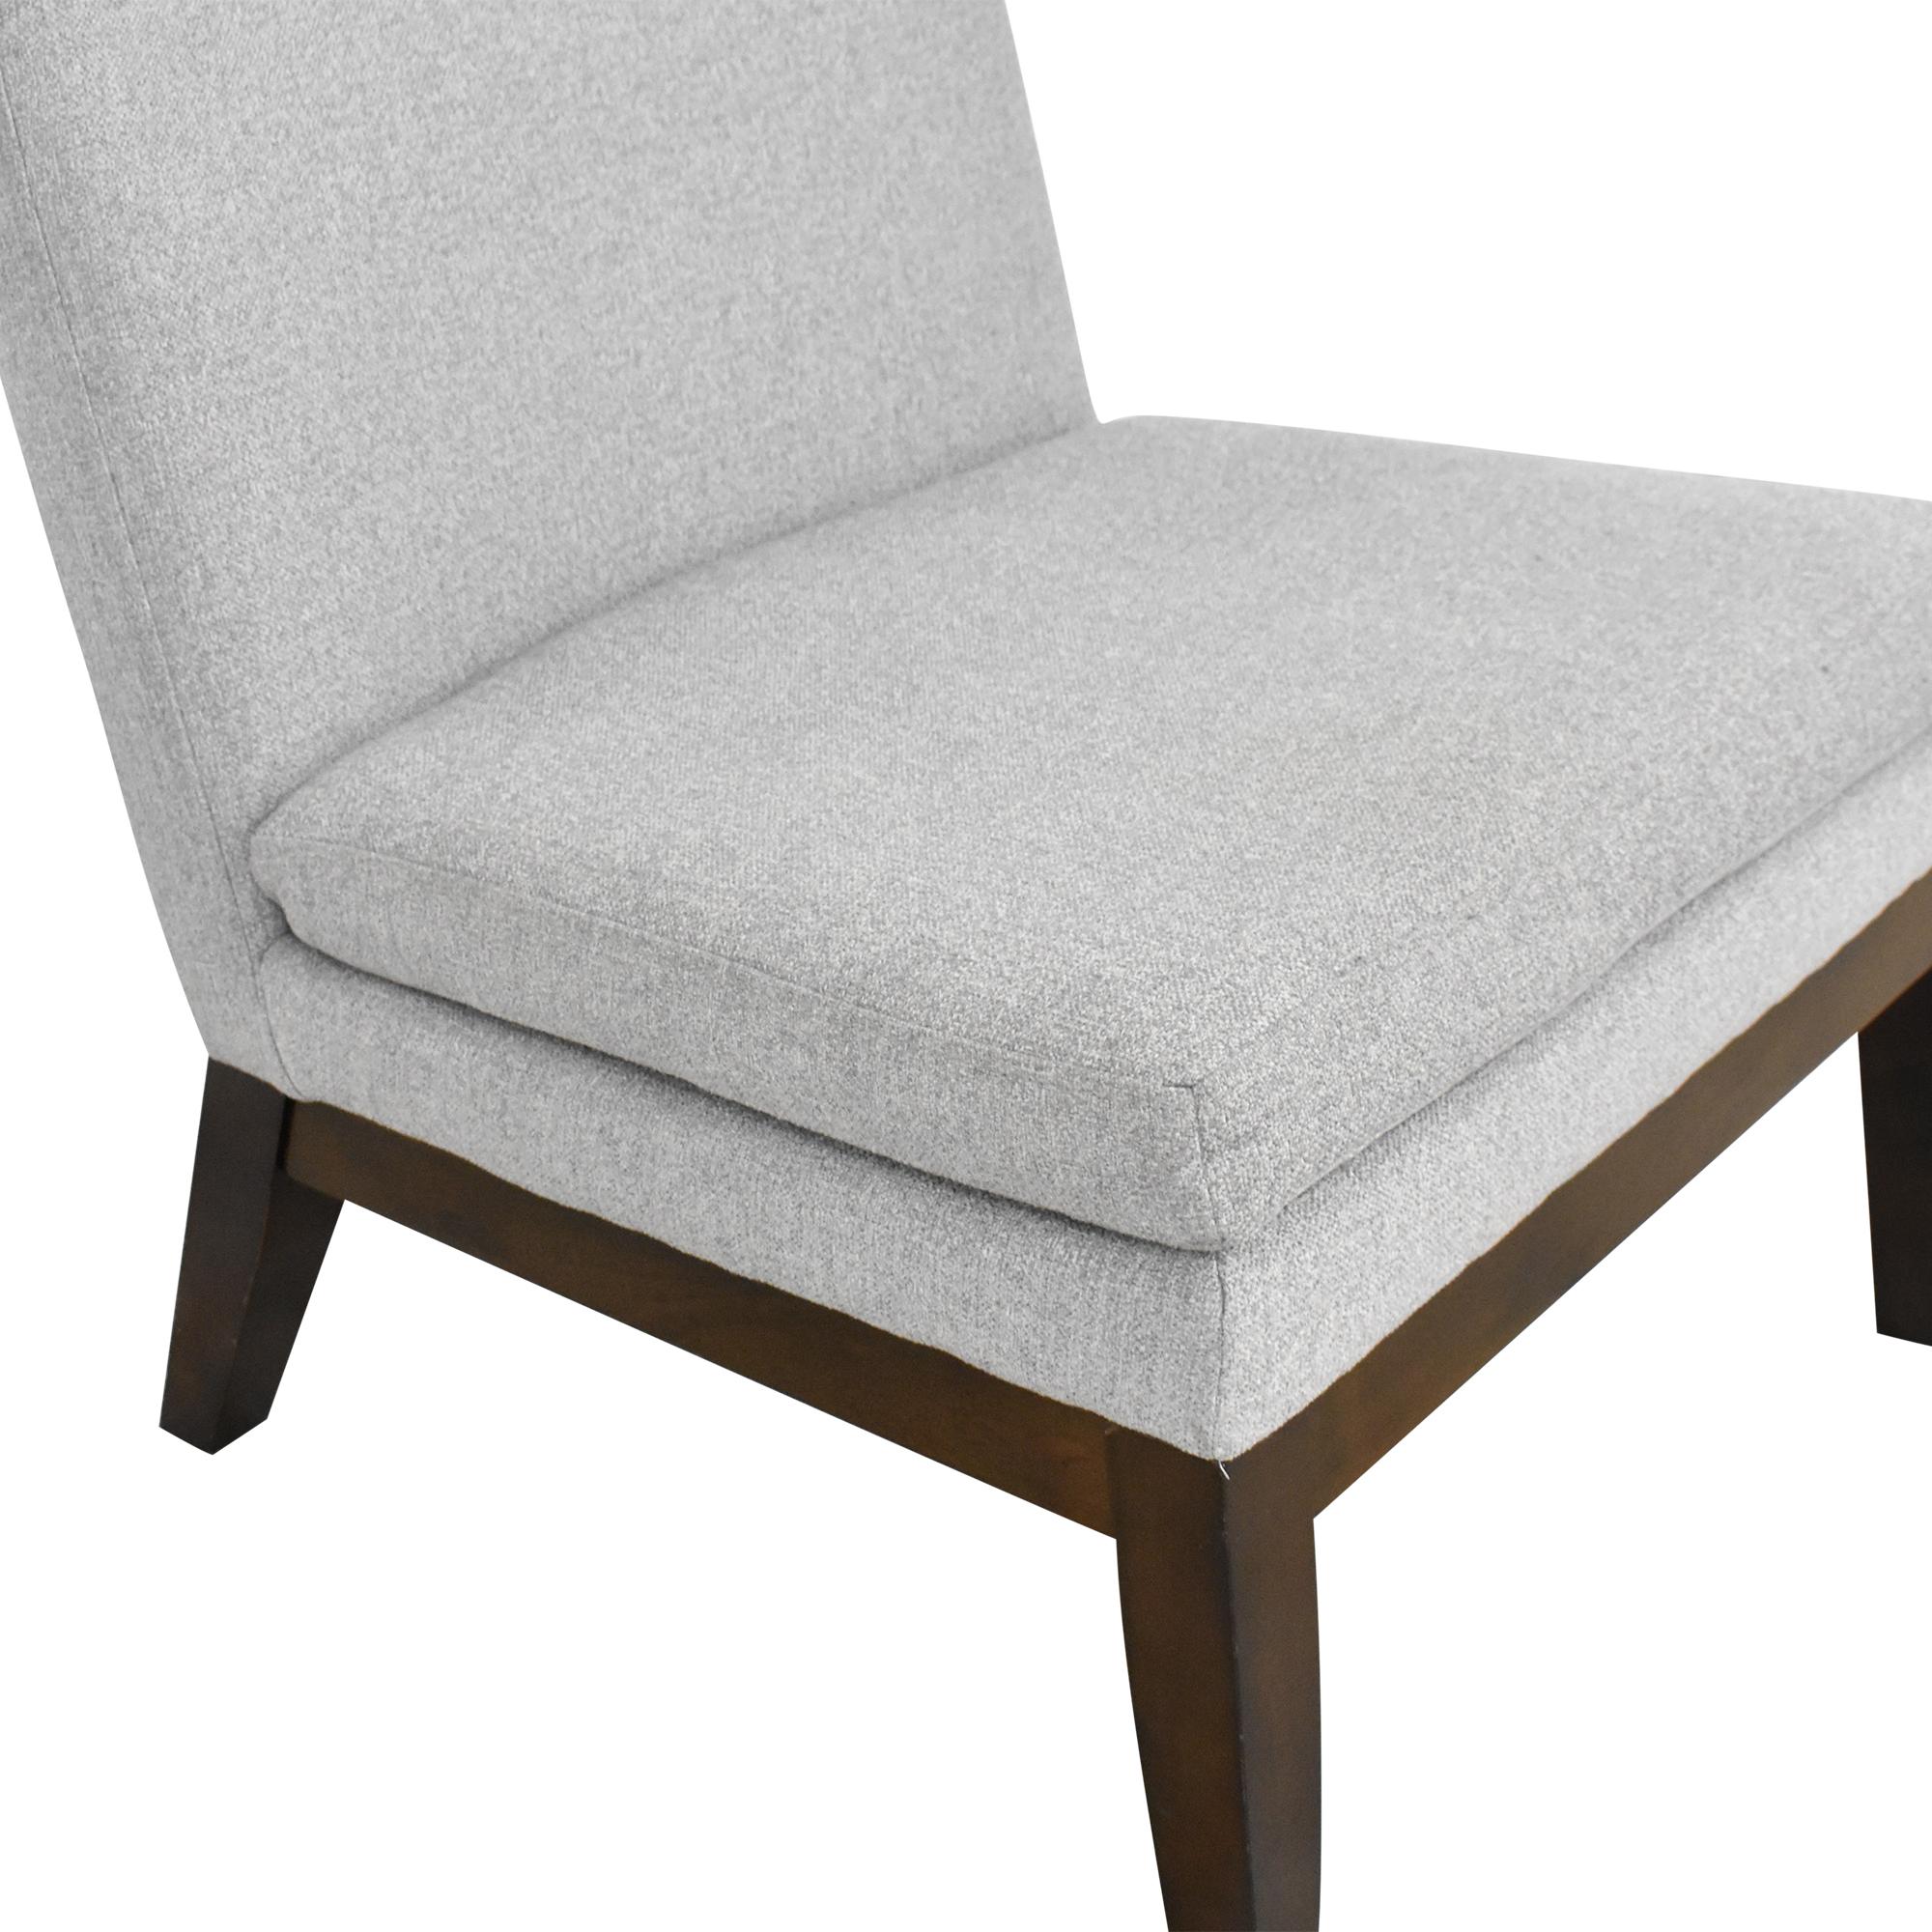 West Elm West Elm Slipper Chair grey